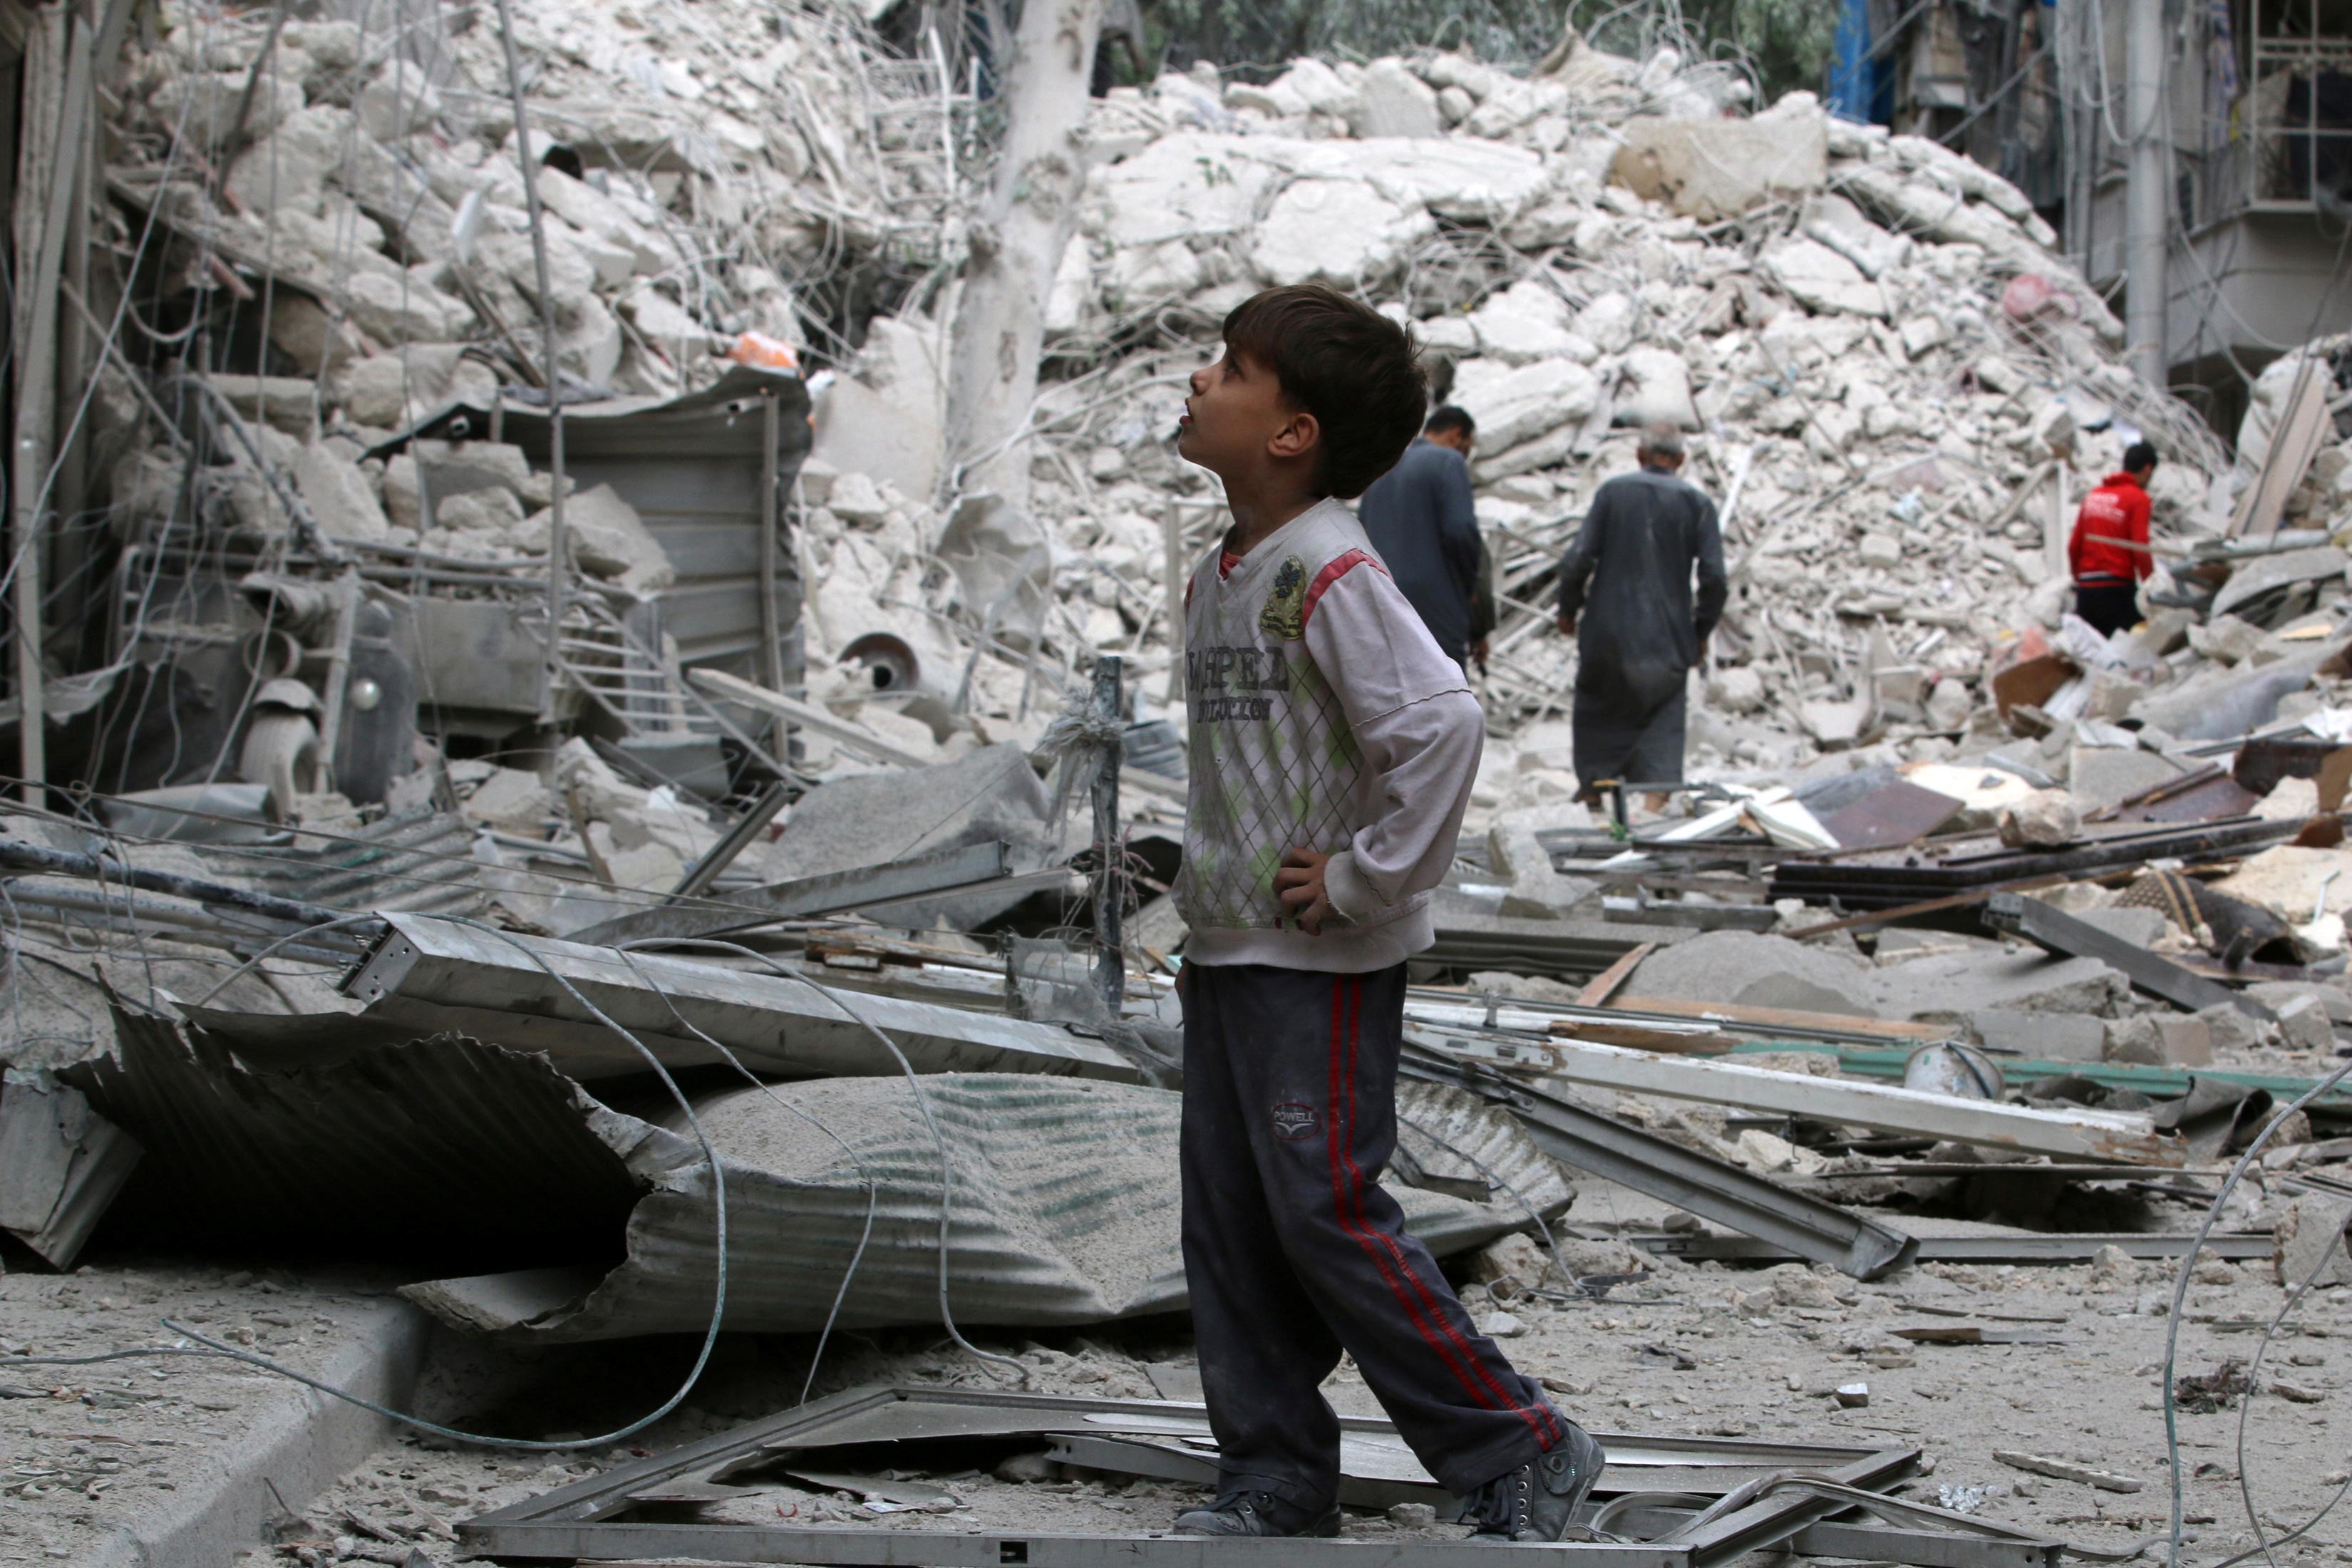 `. REUTERS/Abdalrhman Ismail  - RTSP4CW